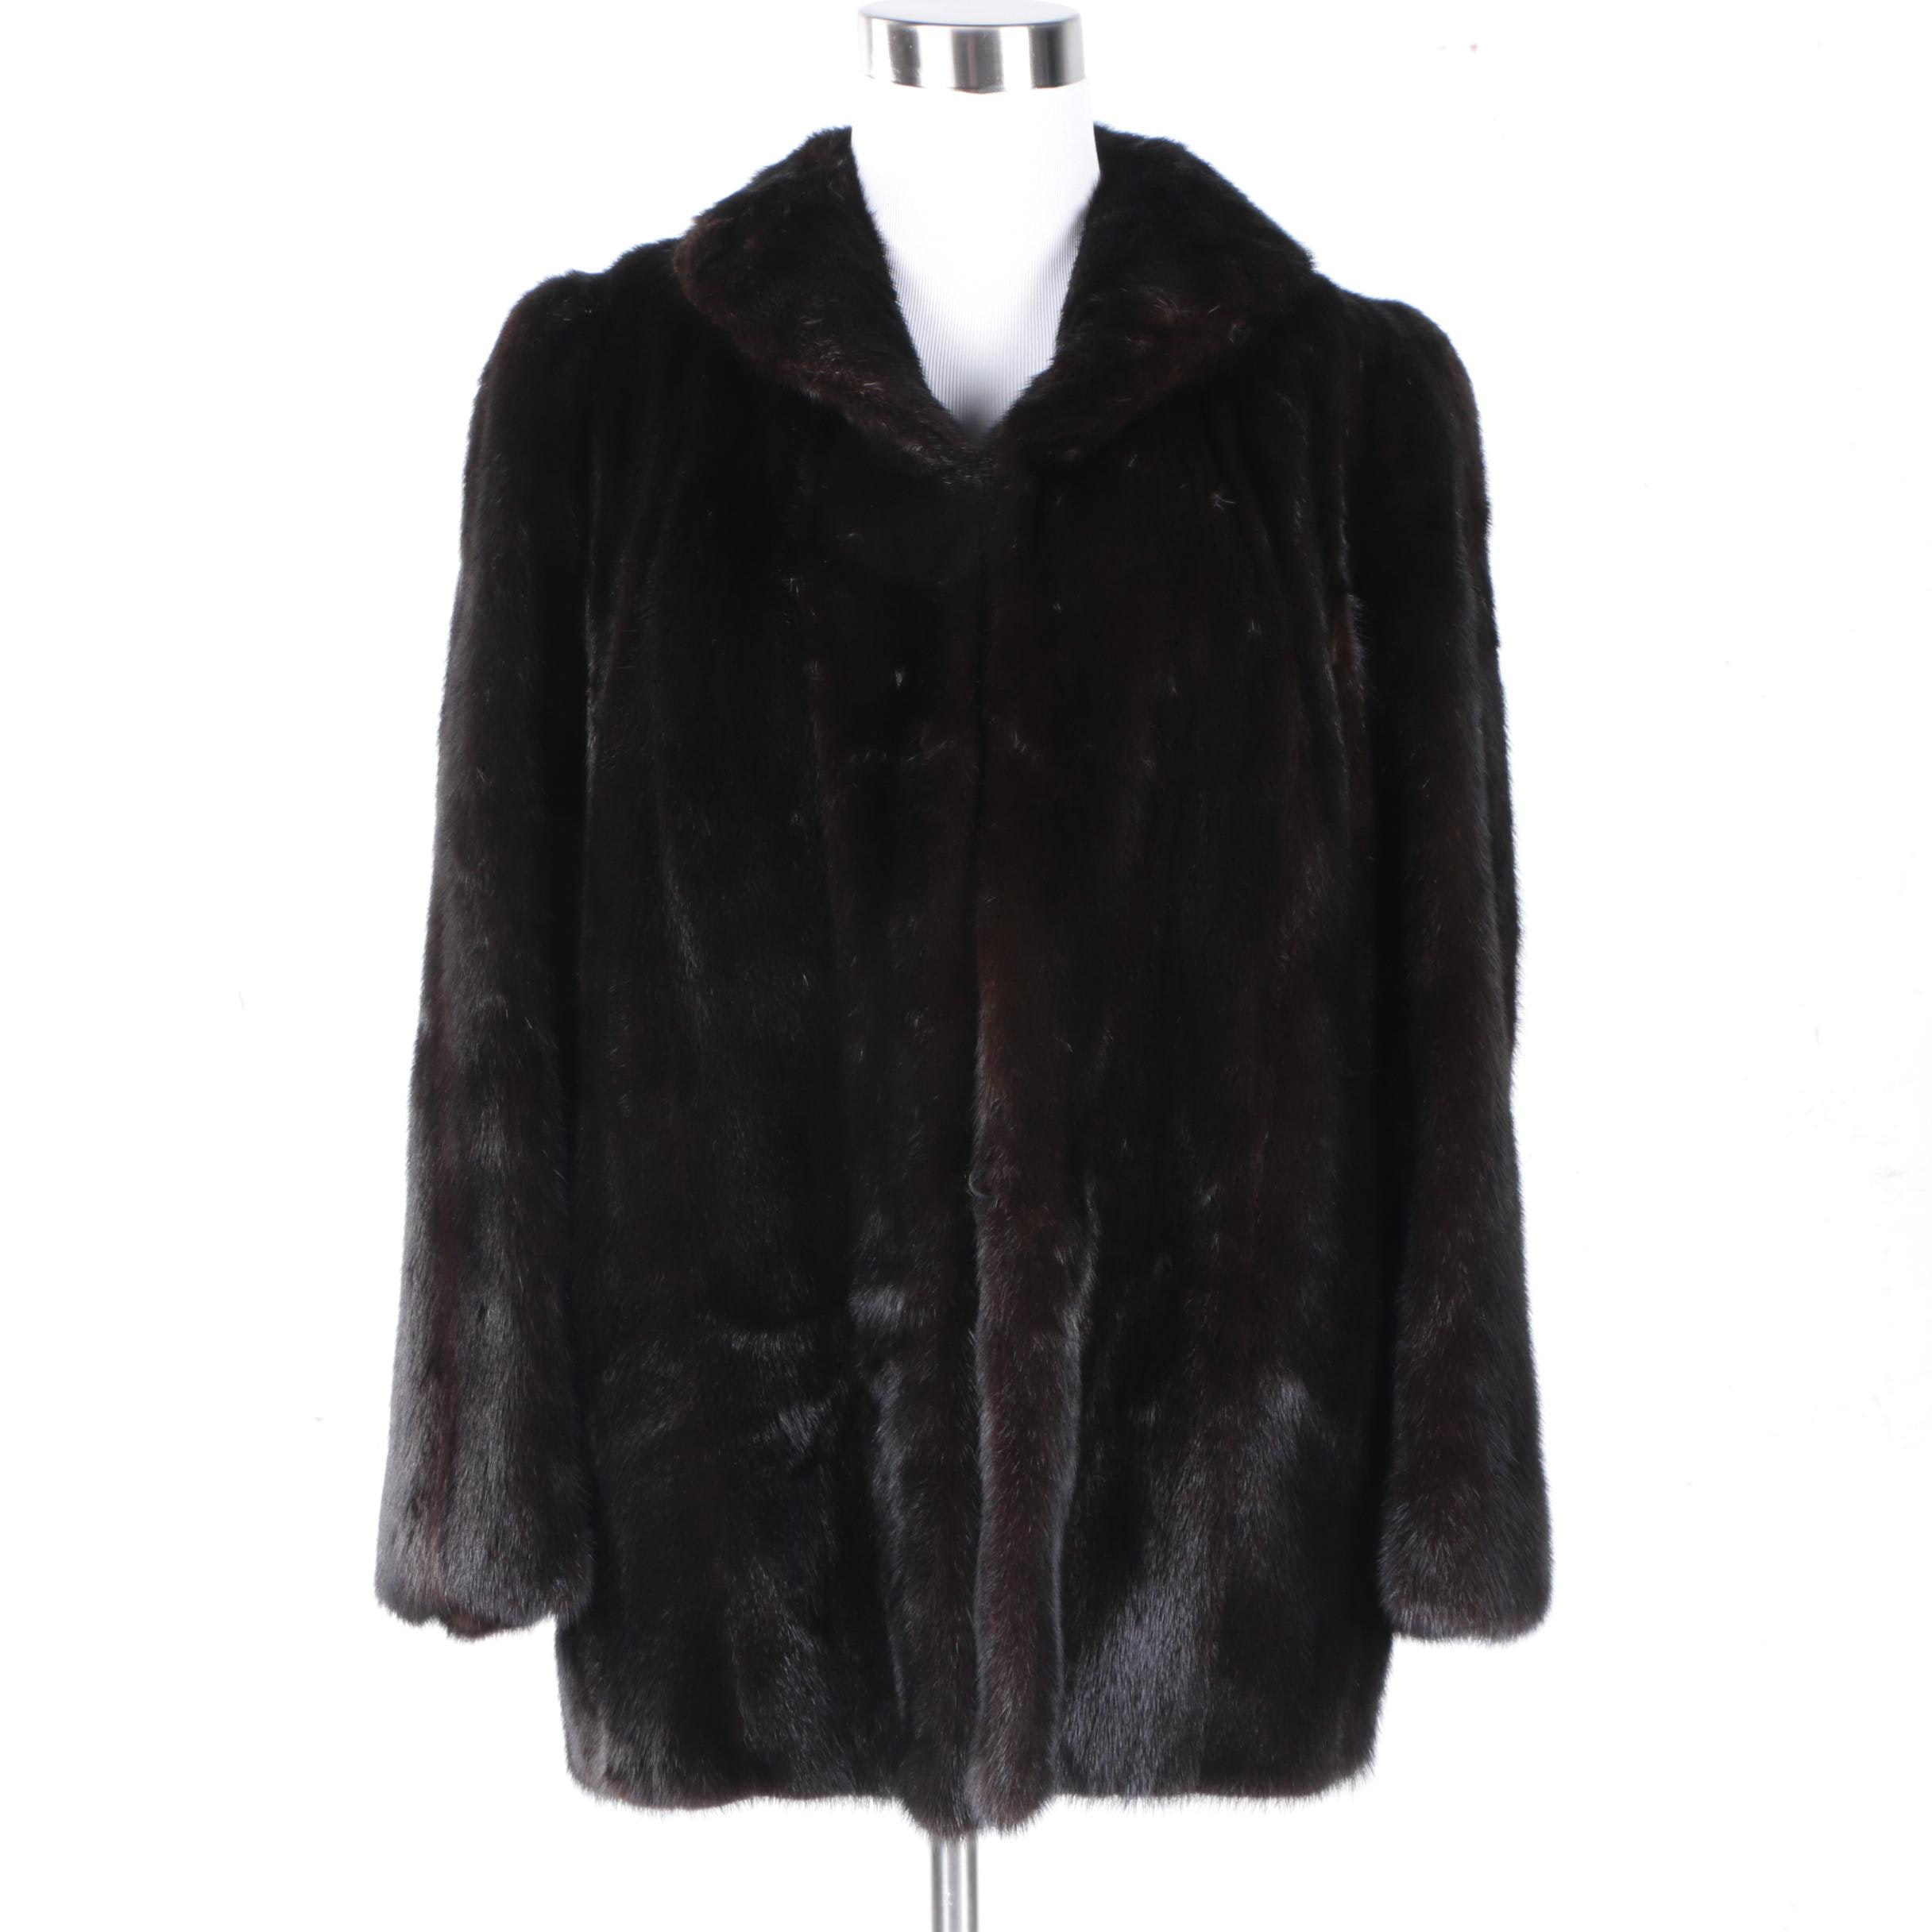 Dark Brown Mink Fur Coat by Eagle Furs